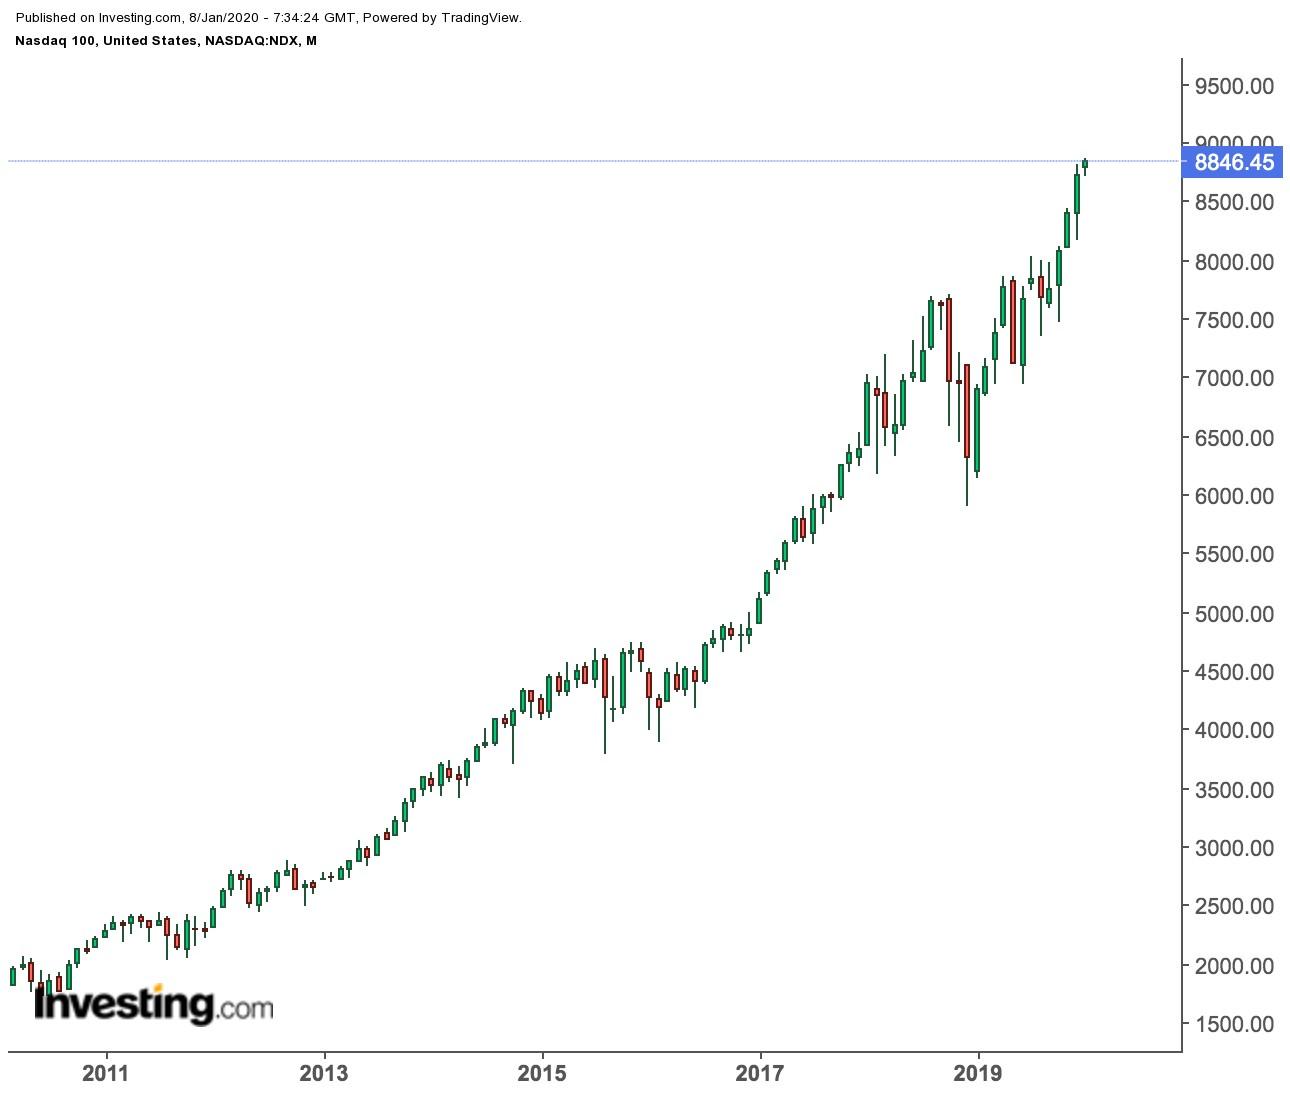 Nasdaq 100 Monthly Price Chart